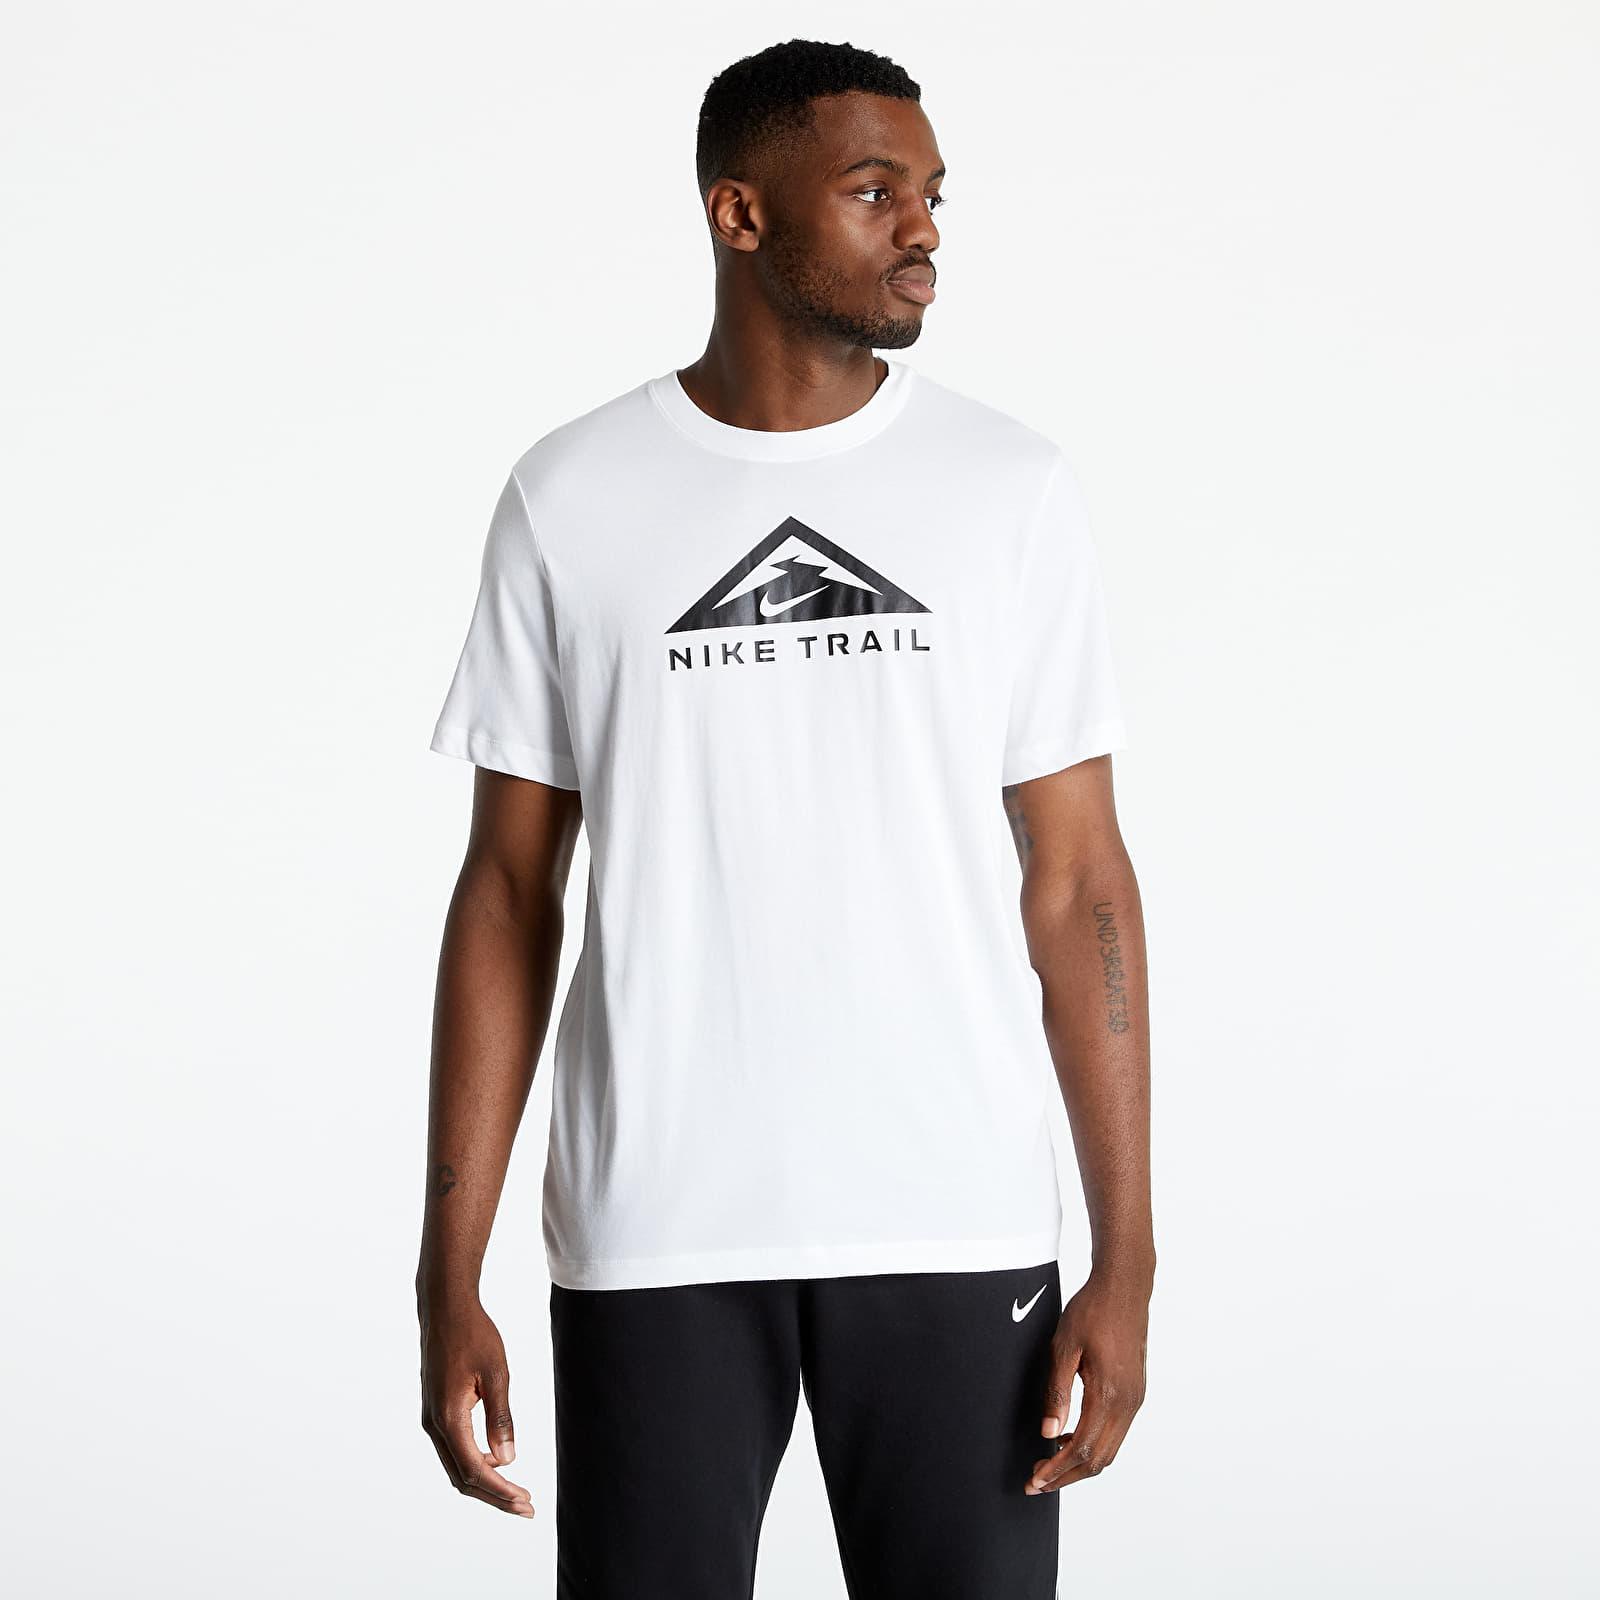 Nike Dri-Fit Short Sleeved Tee Trail White S